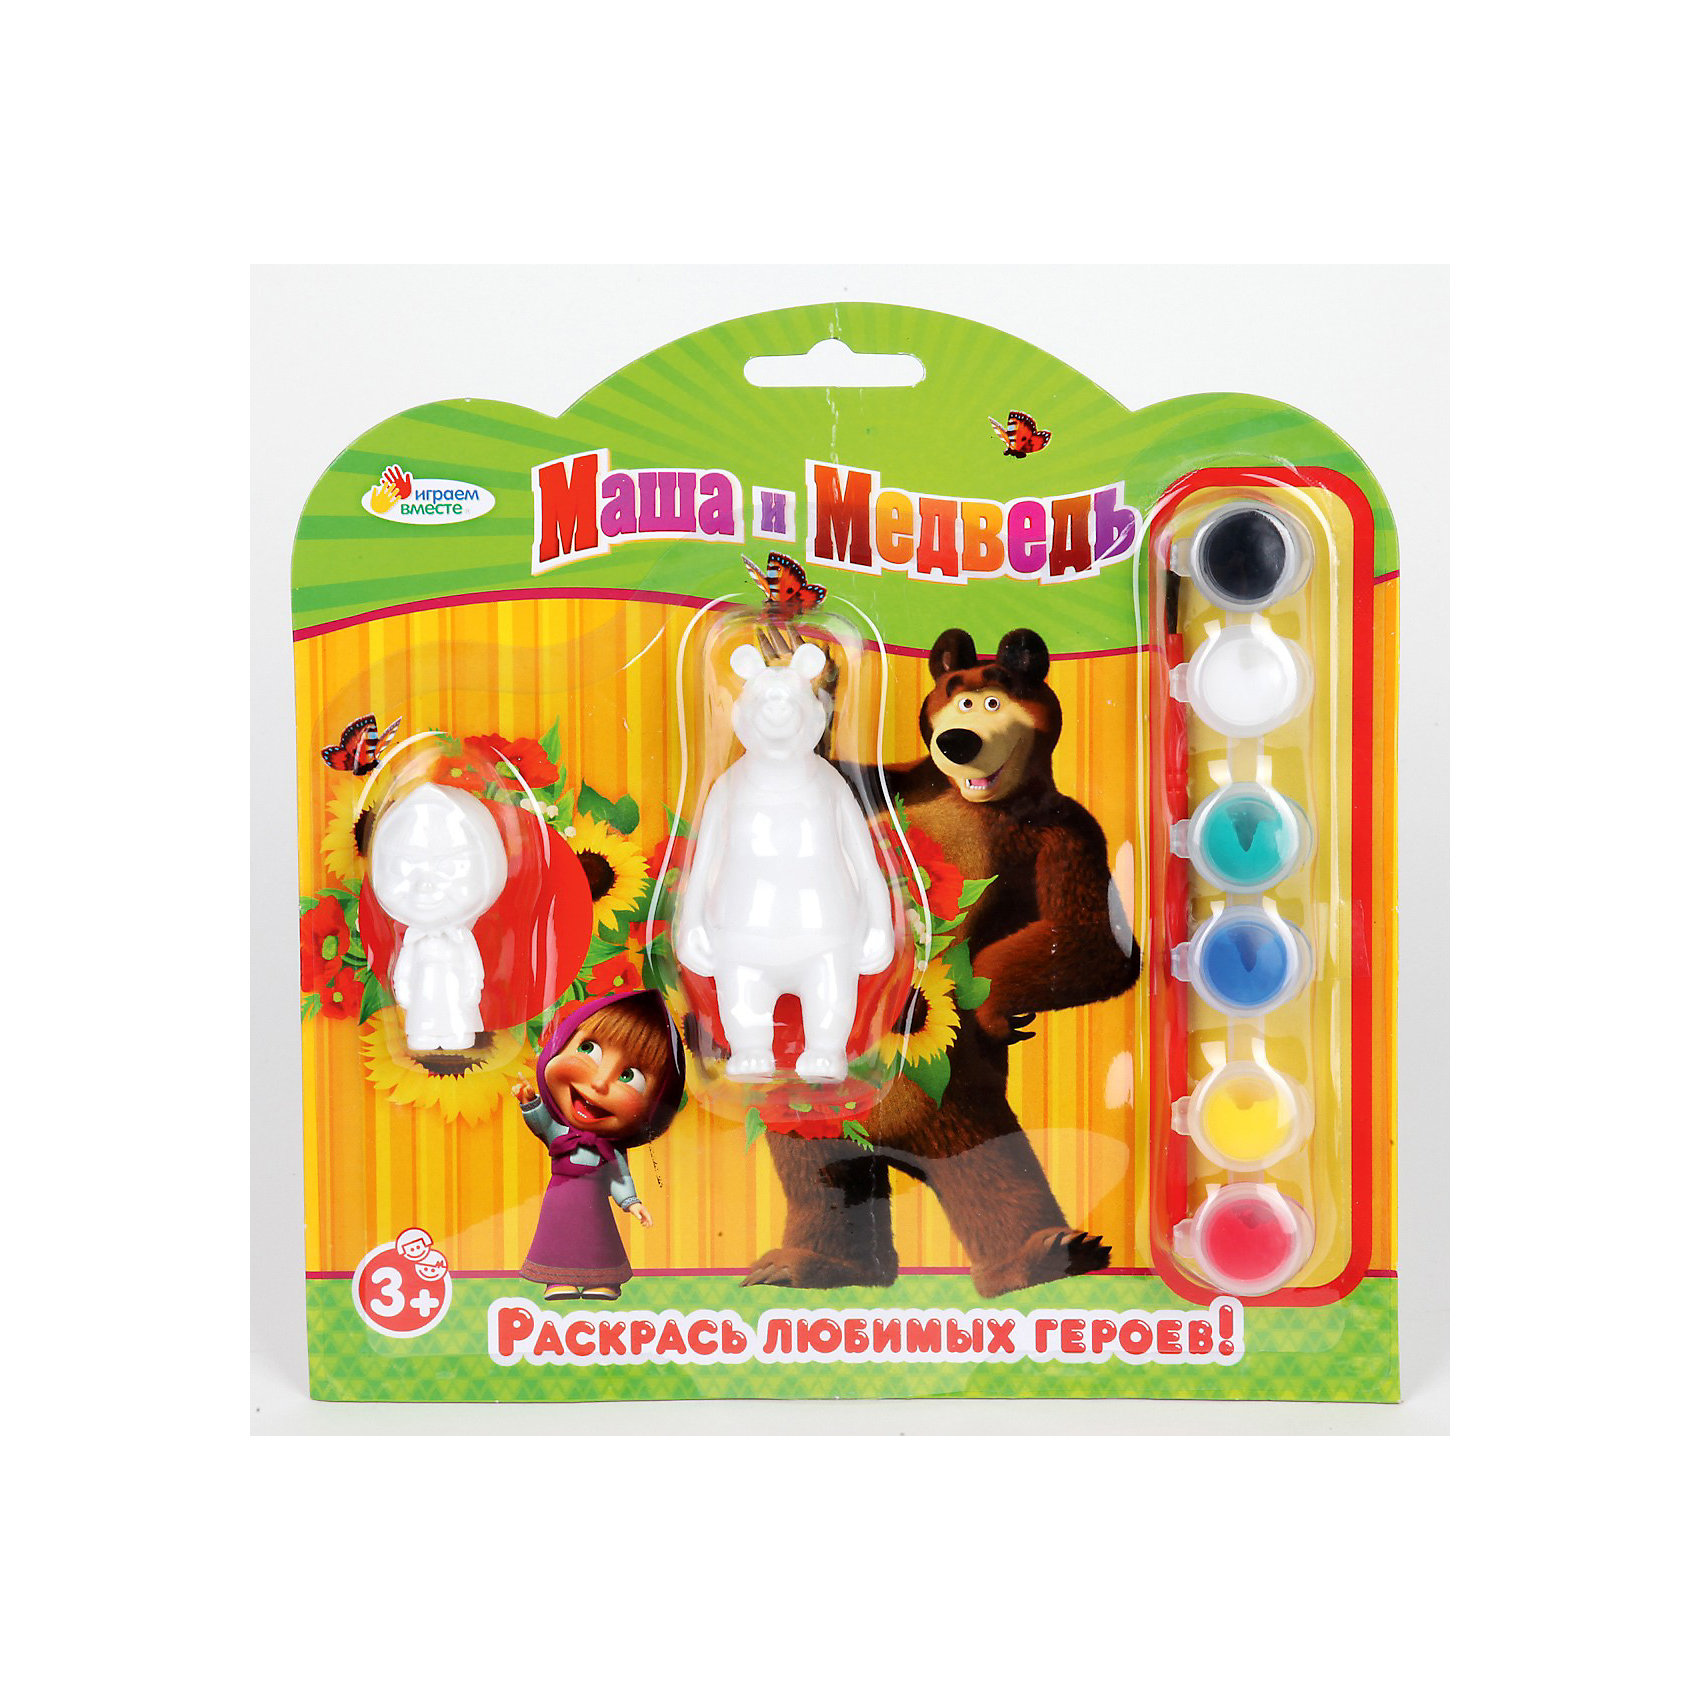 Играем вместе Набор-раскраска, Маша и Медведь,  2 фигурки